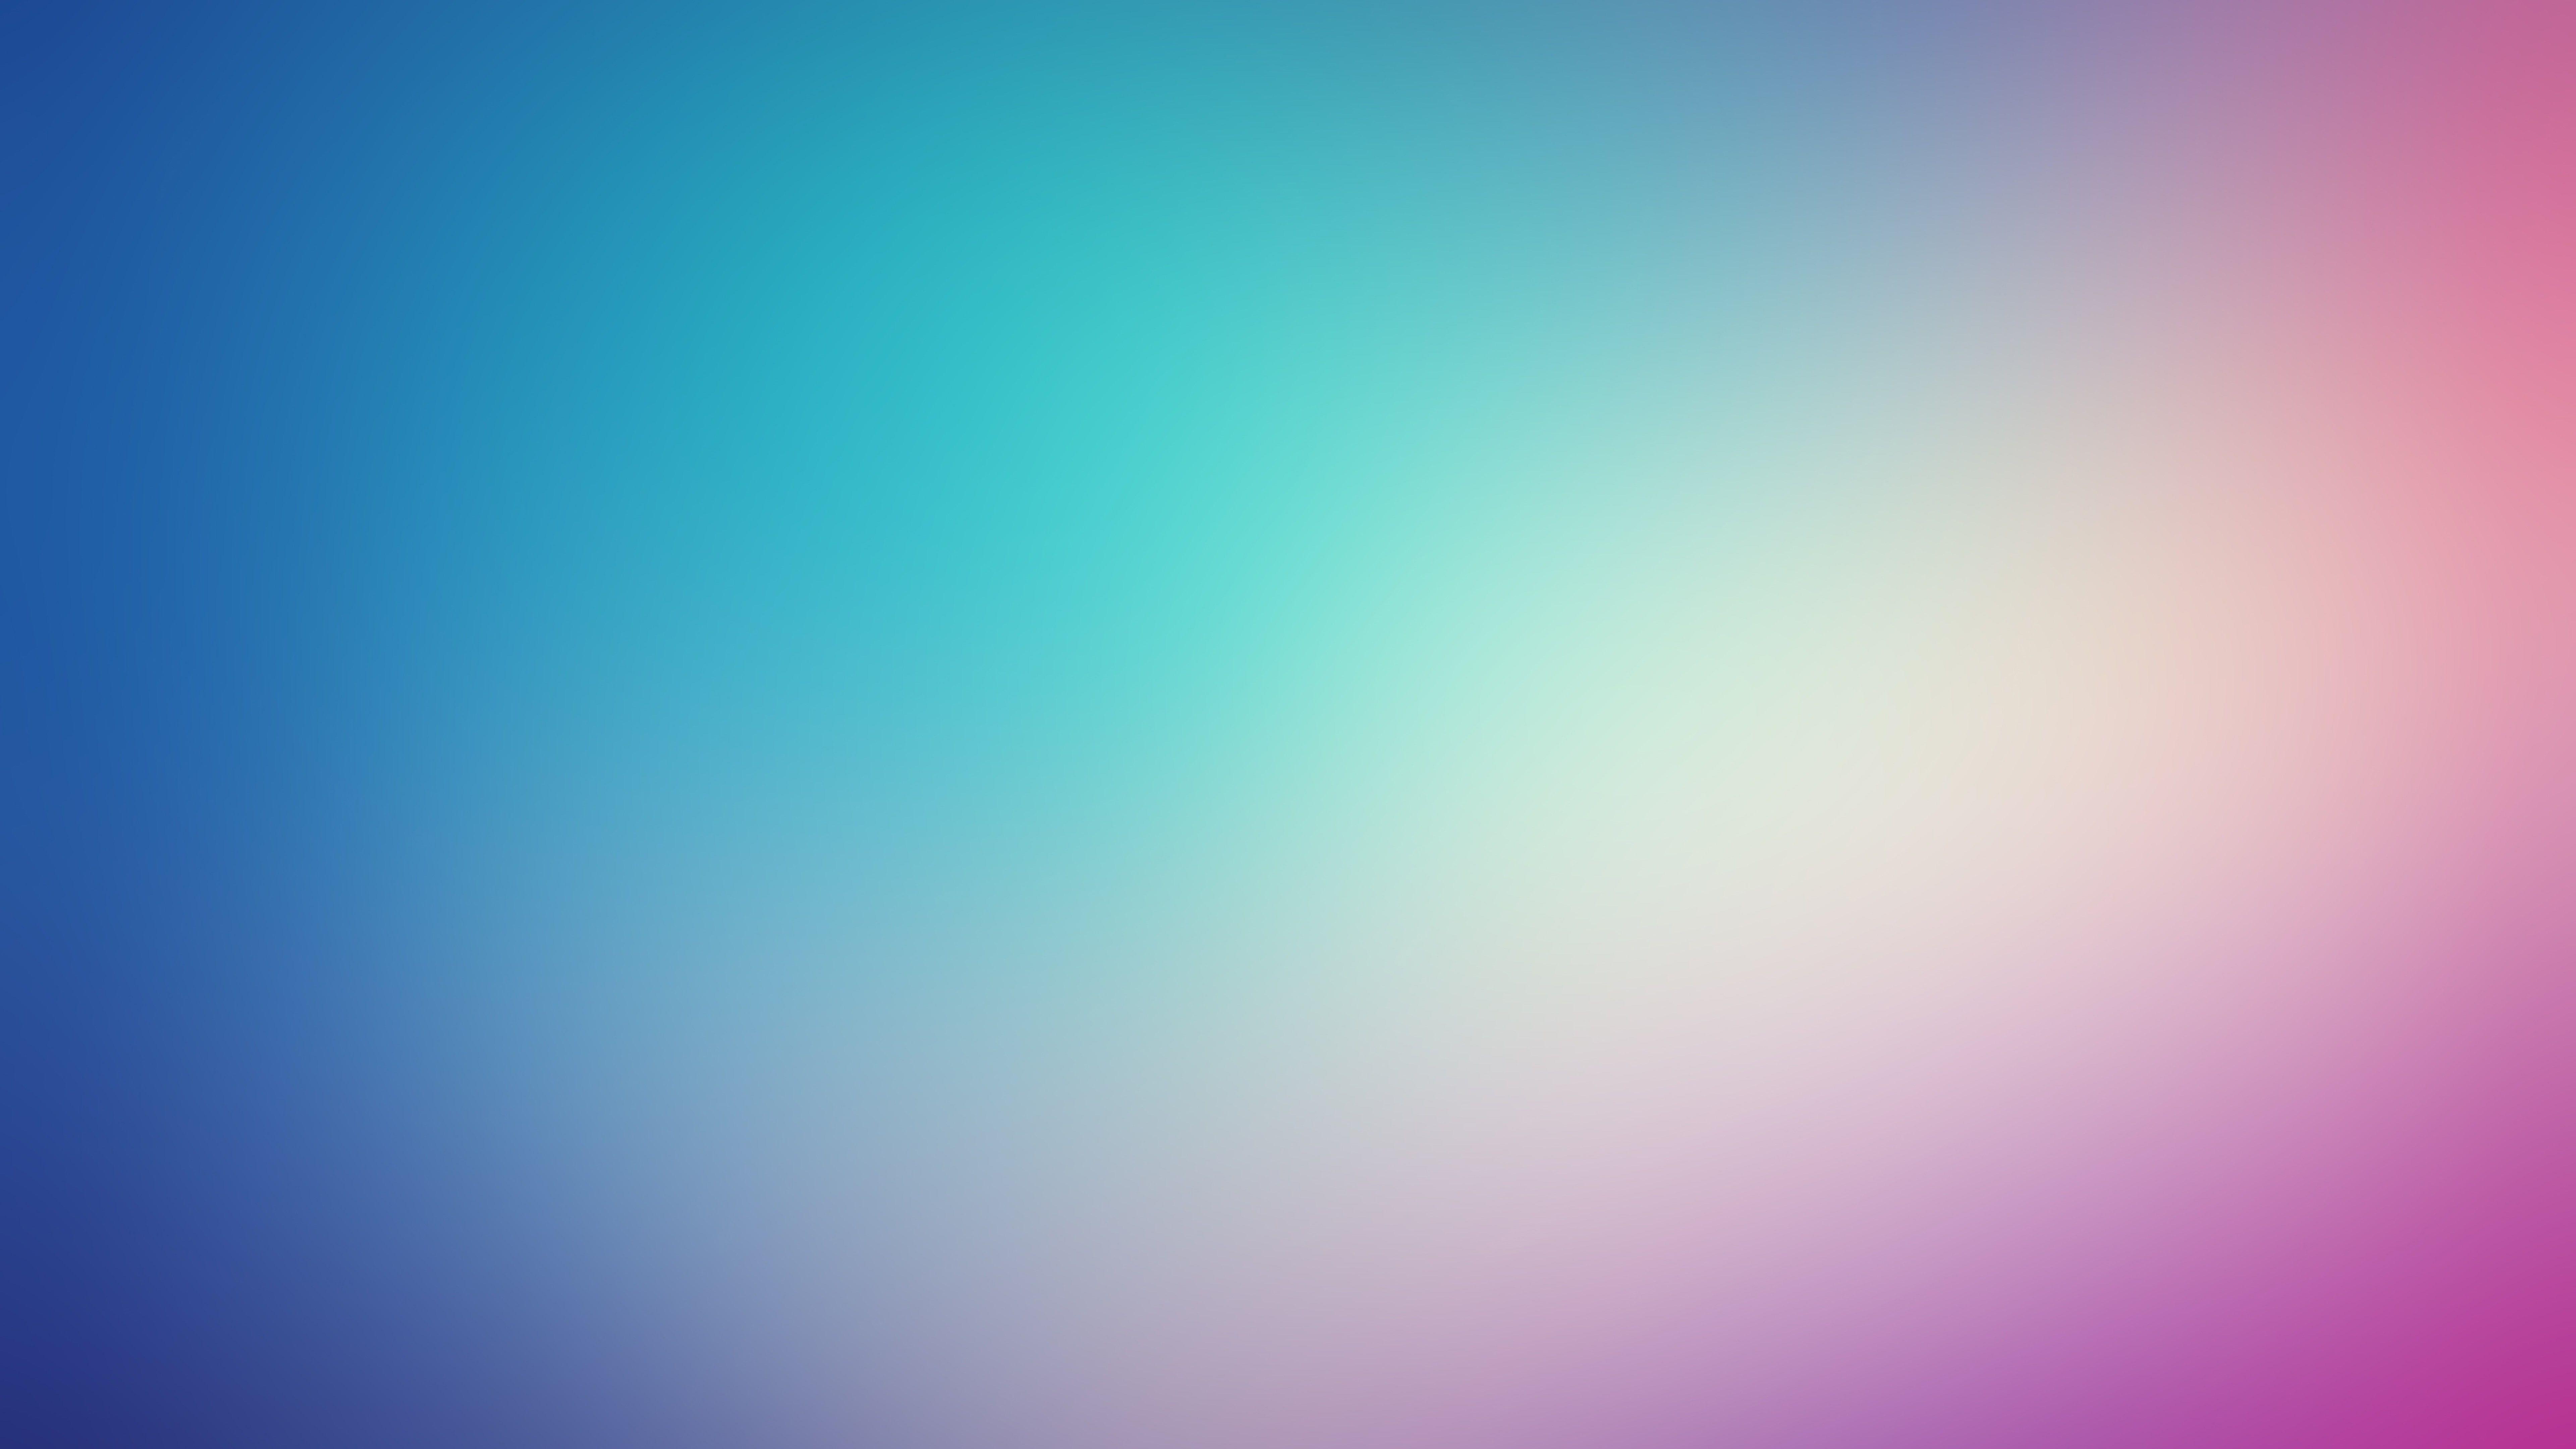 Gradient Creamy 4k 8k Hd 8k Wallpaper Hdwallpaper Desktop